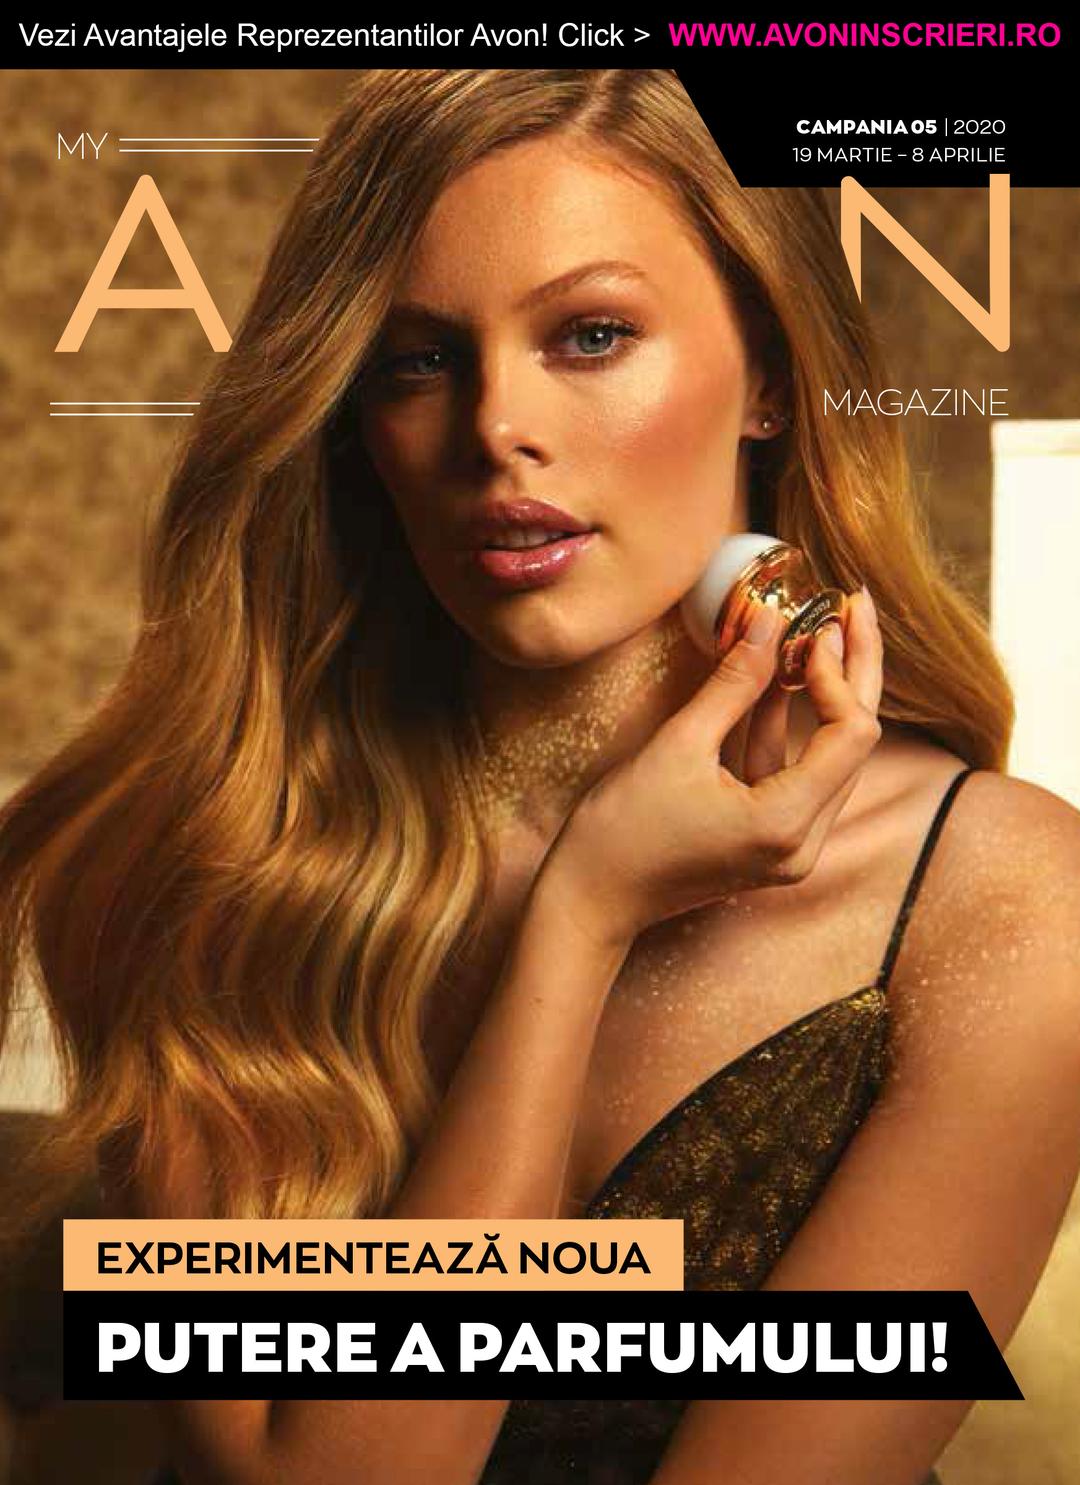 Page 1 of Revista My Avon Magazine C5/2020 - www.avoninscrieri.ro